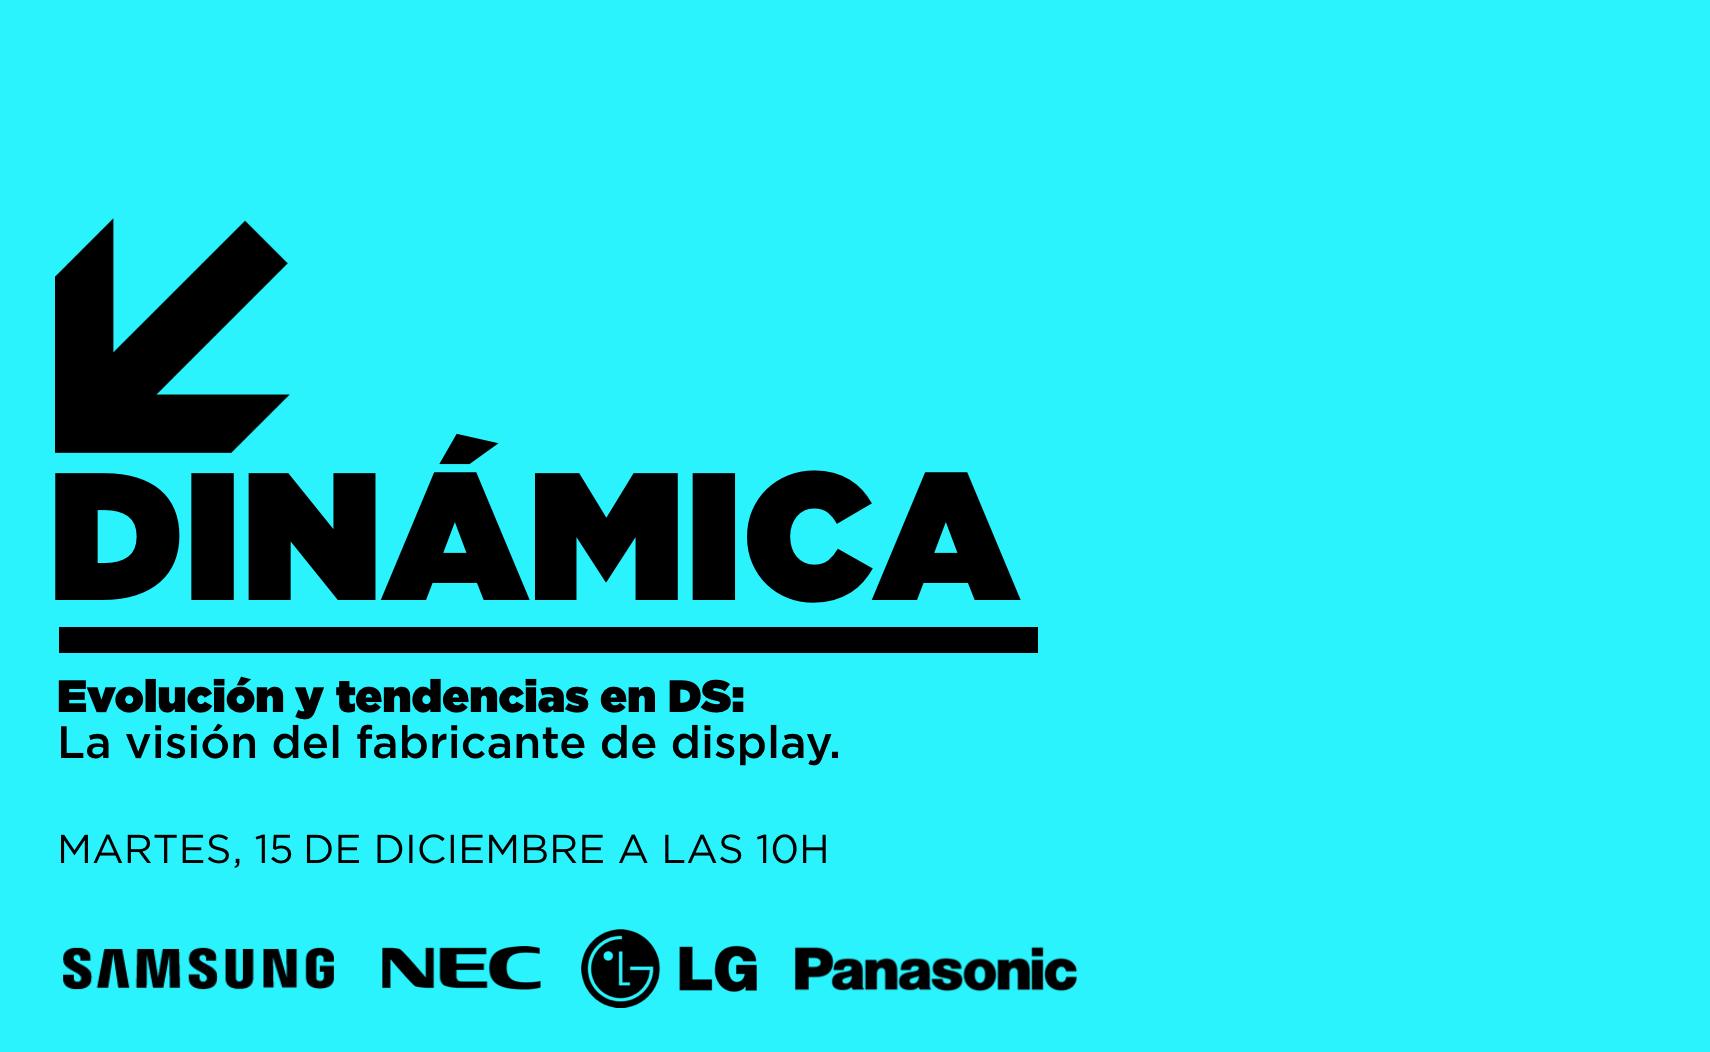 Dinámica logo